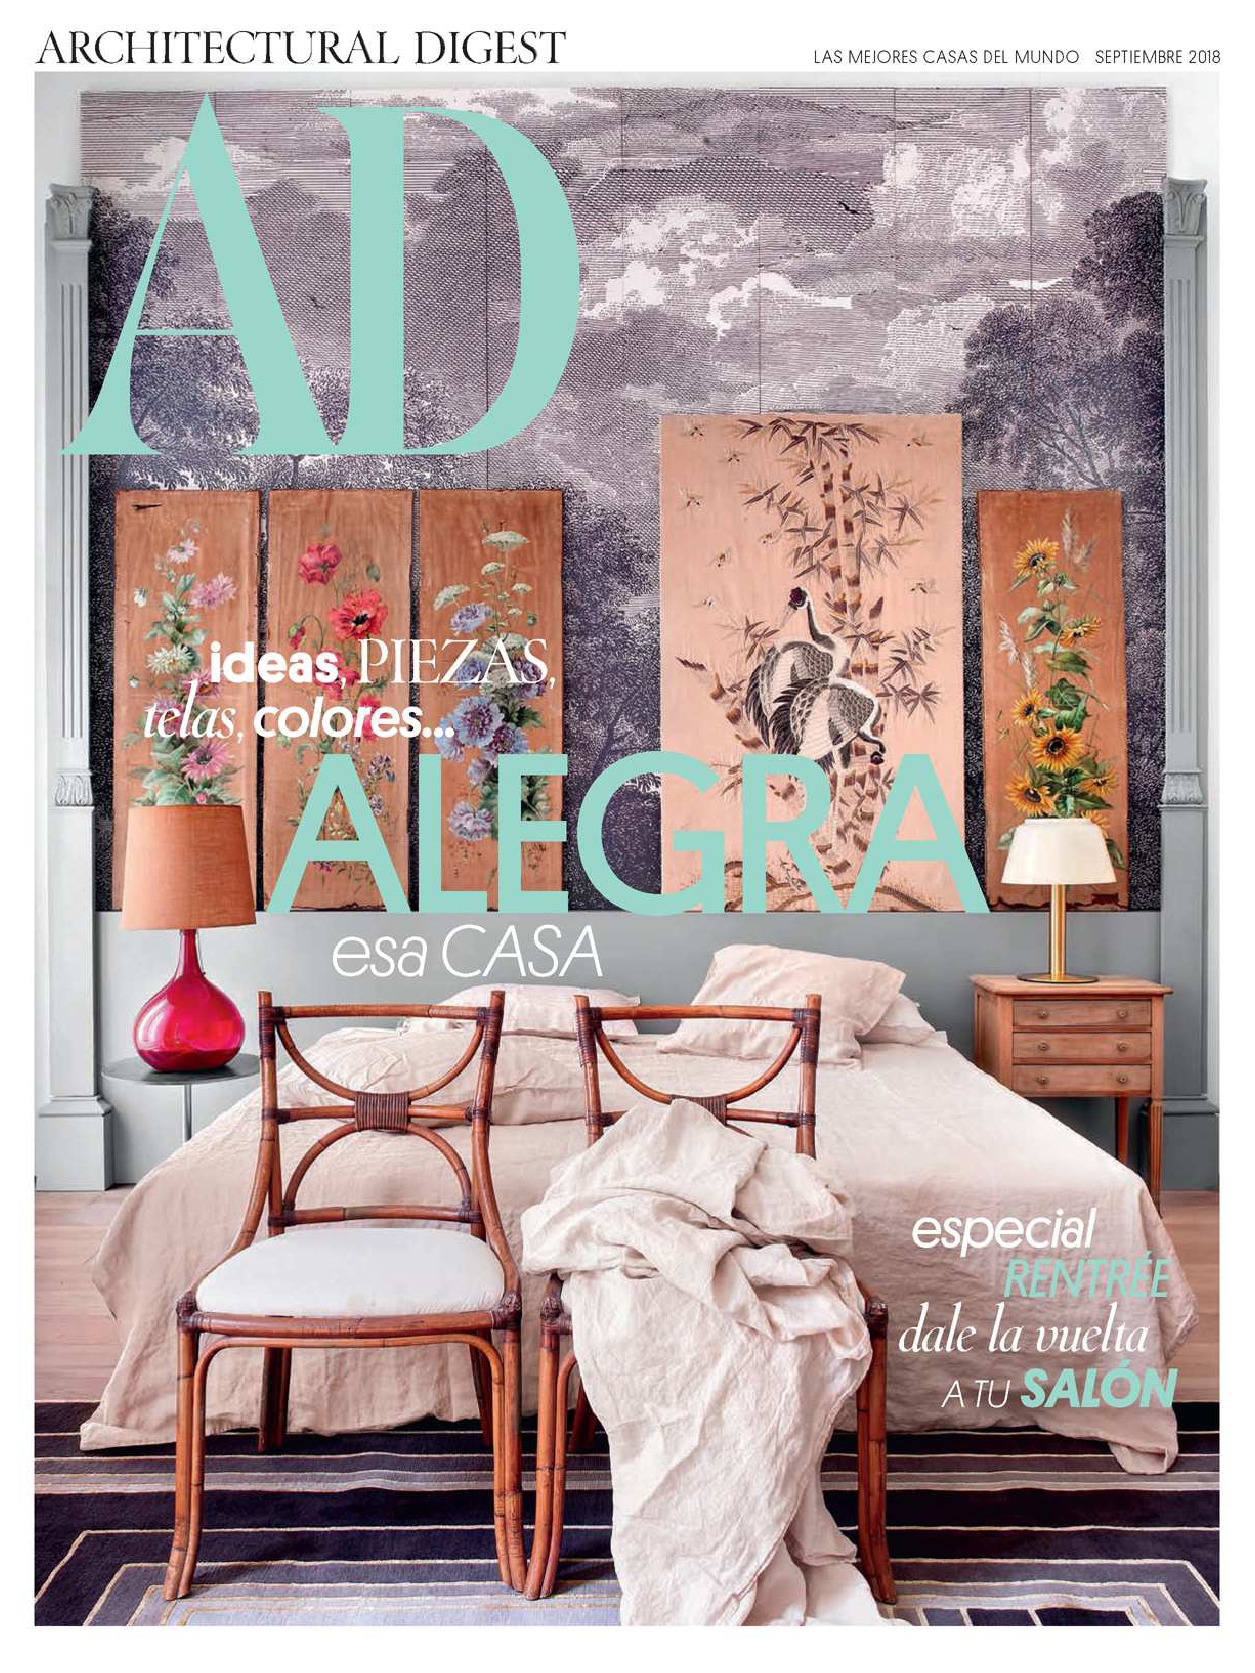 《AD》西班牙版室内室外设计杂志2018年09月号